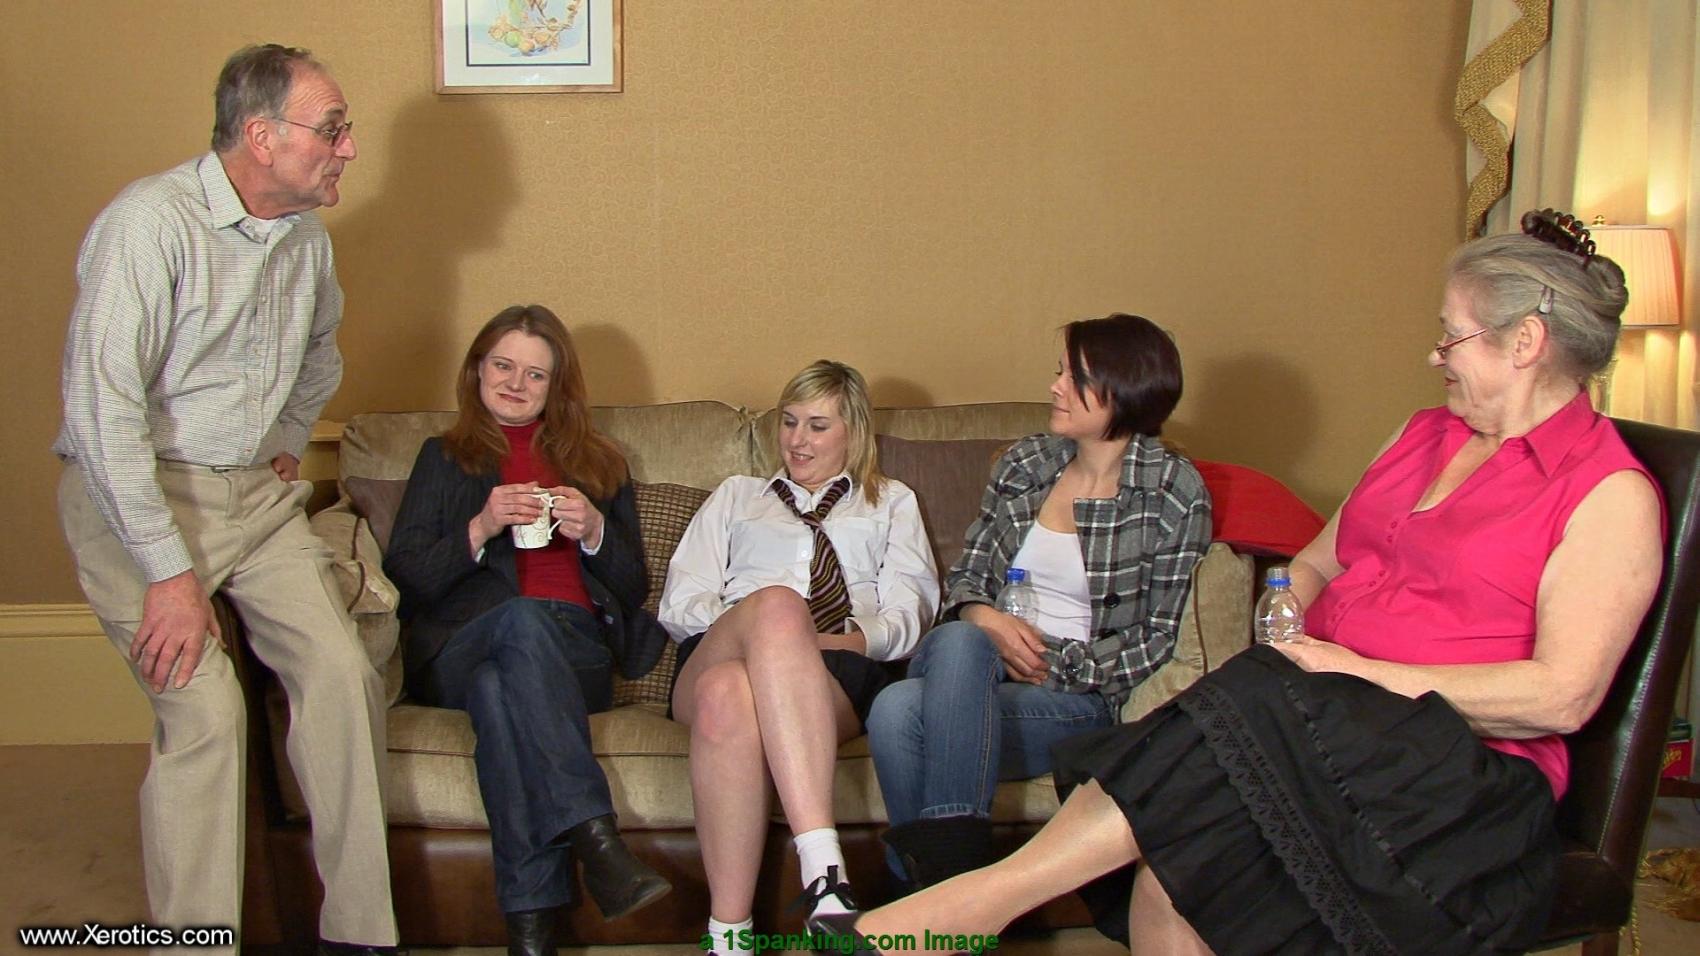 Teen grannies pantyhose reality